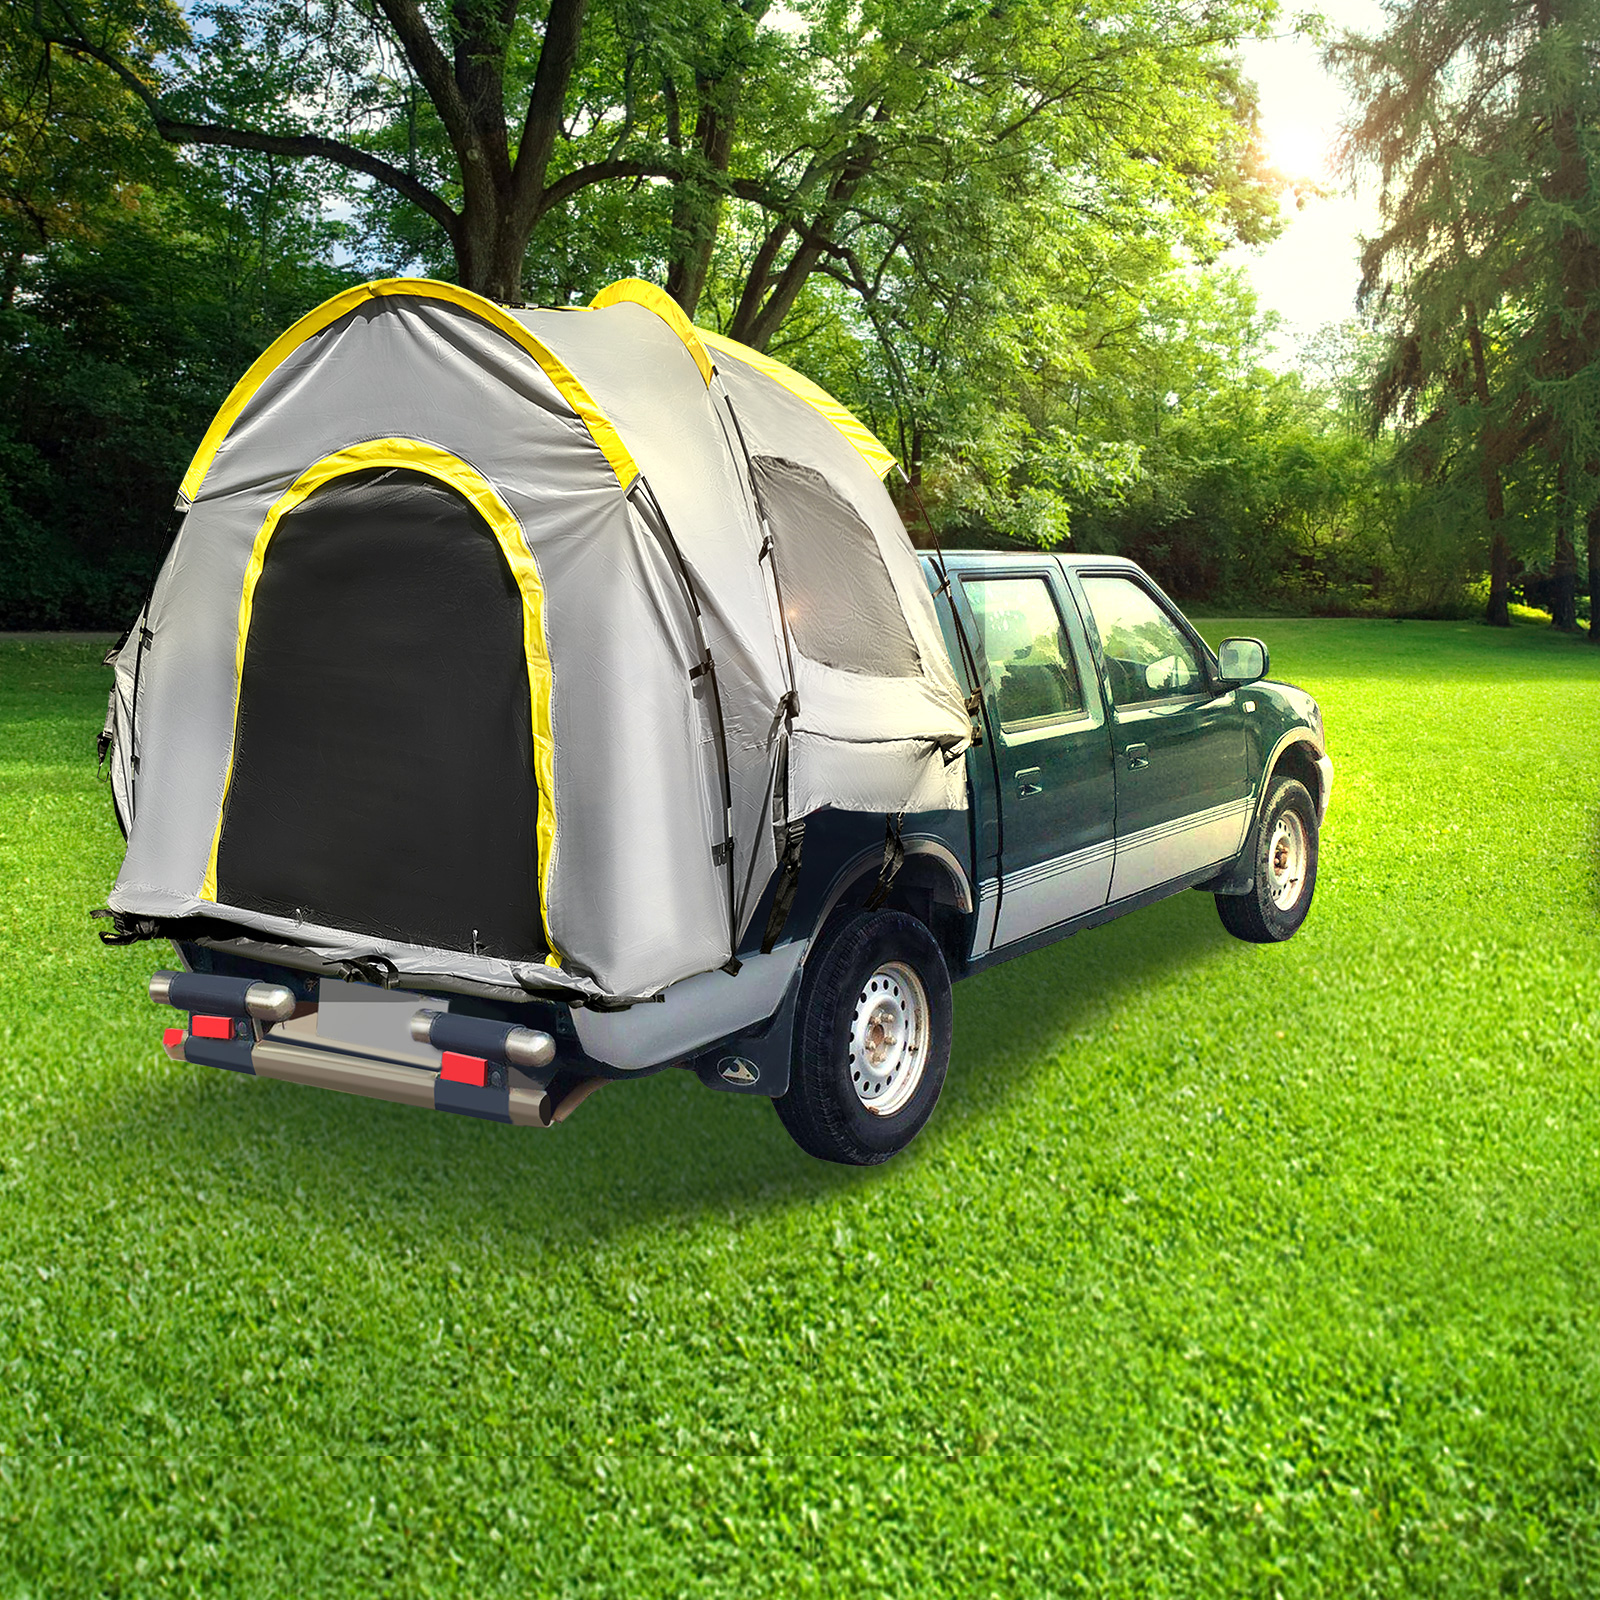 thumbnail 12 - VEVOR Truck Tent Truck Bed Tent 5' - 8' Pickup Tent Waterproof Outdoor Camping